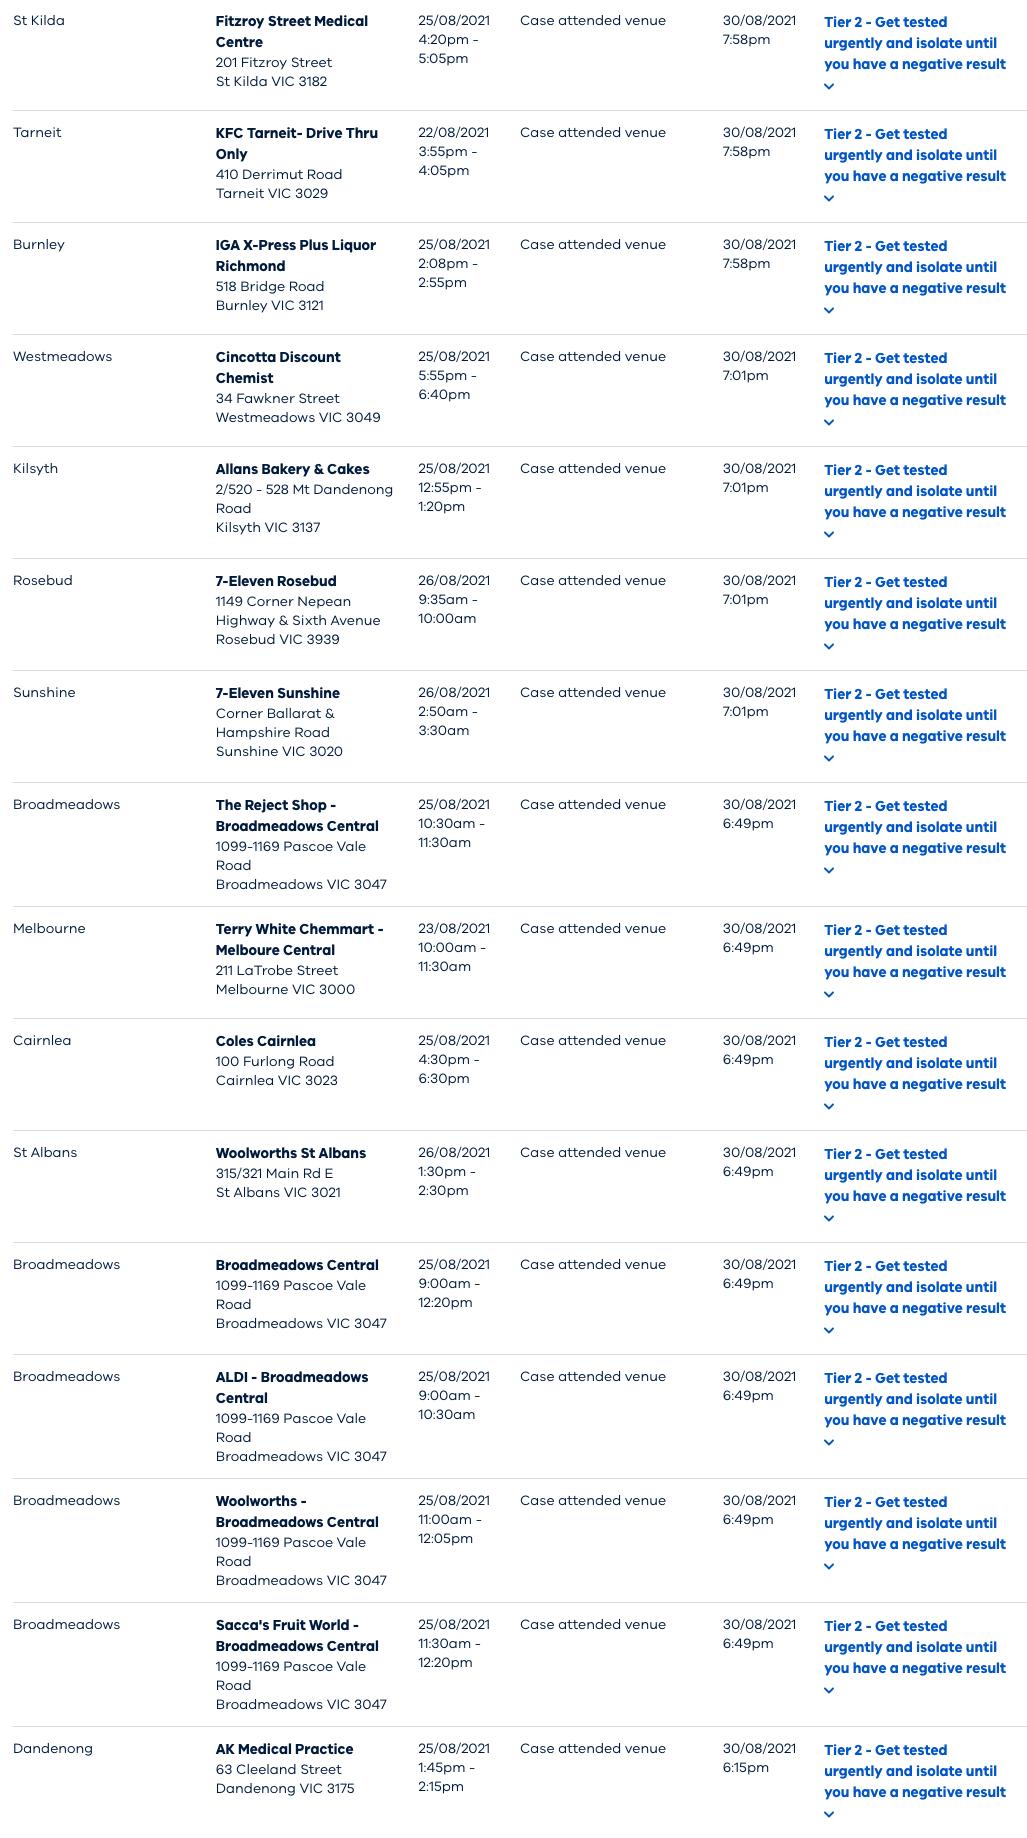 www.coronavirus.vic.gov.au_exposure-sites (24).png